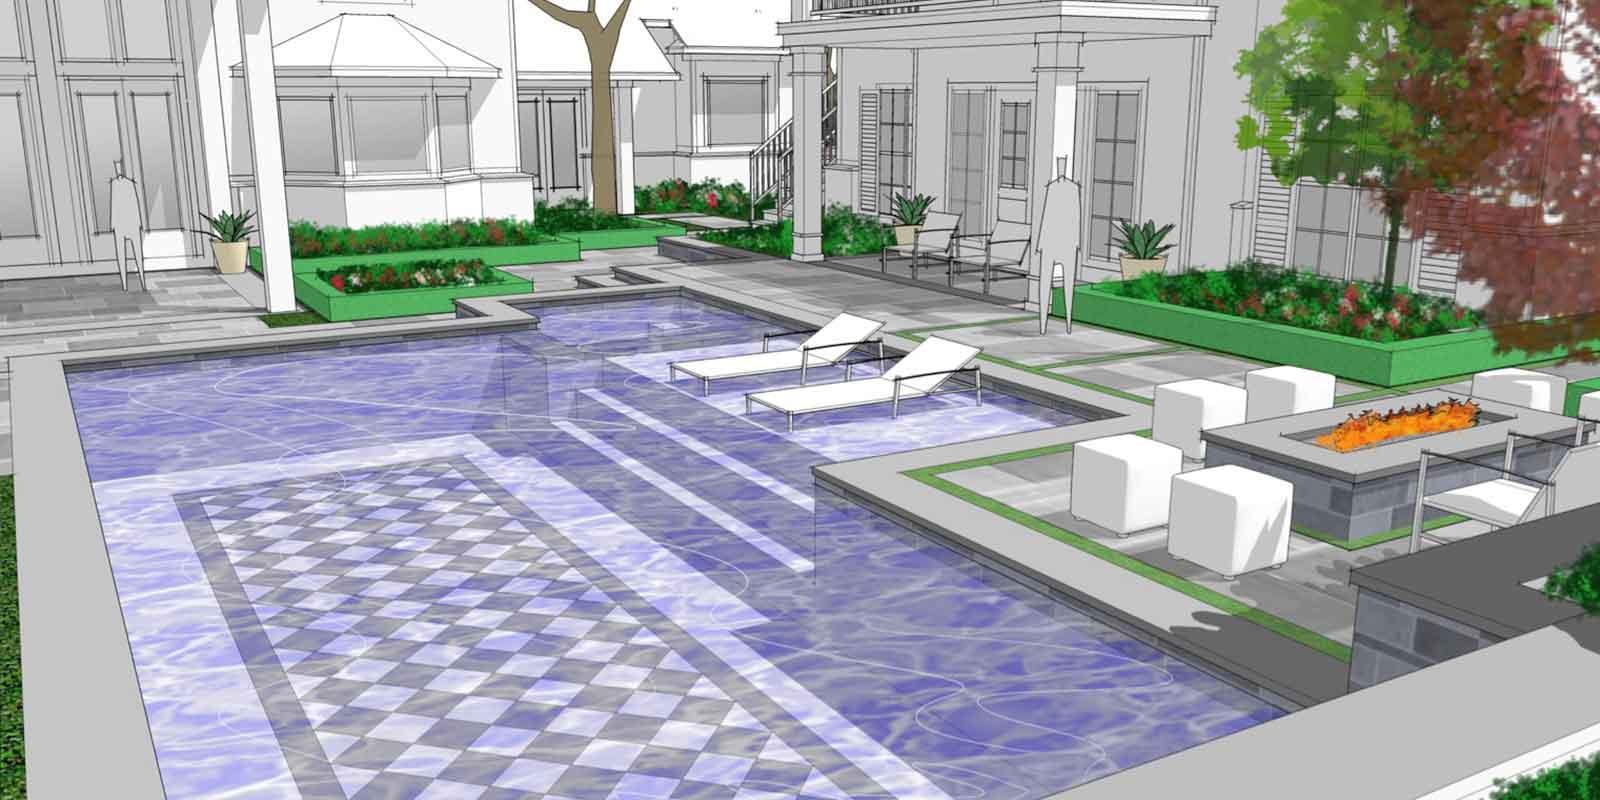 farquhar-swimming-pool-landscape-design